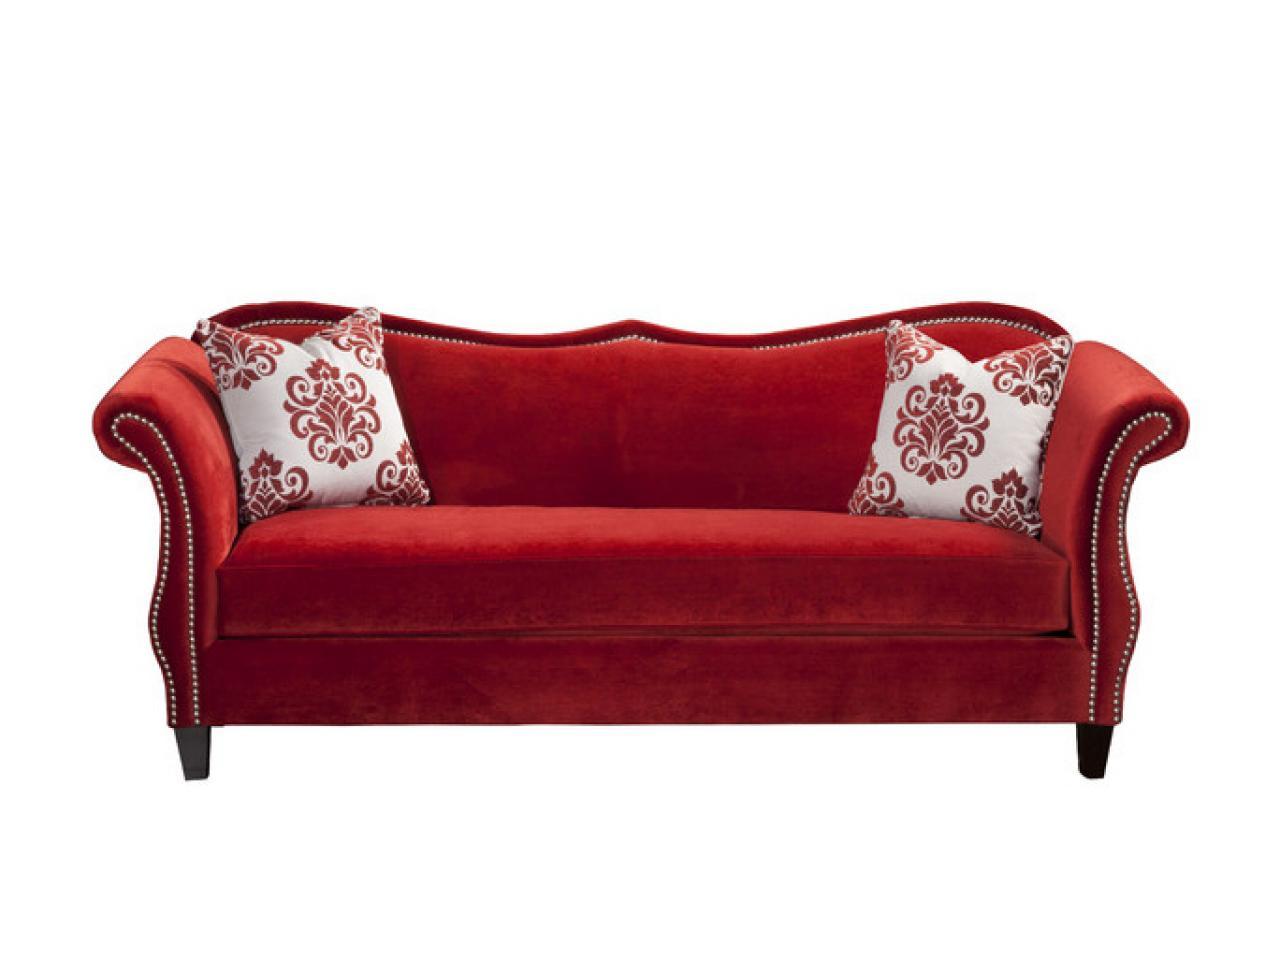 11 Of The Best Velvet Sofas To Decorate